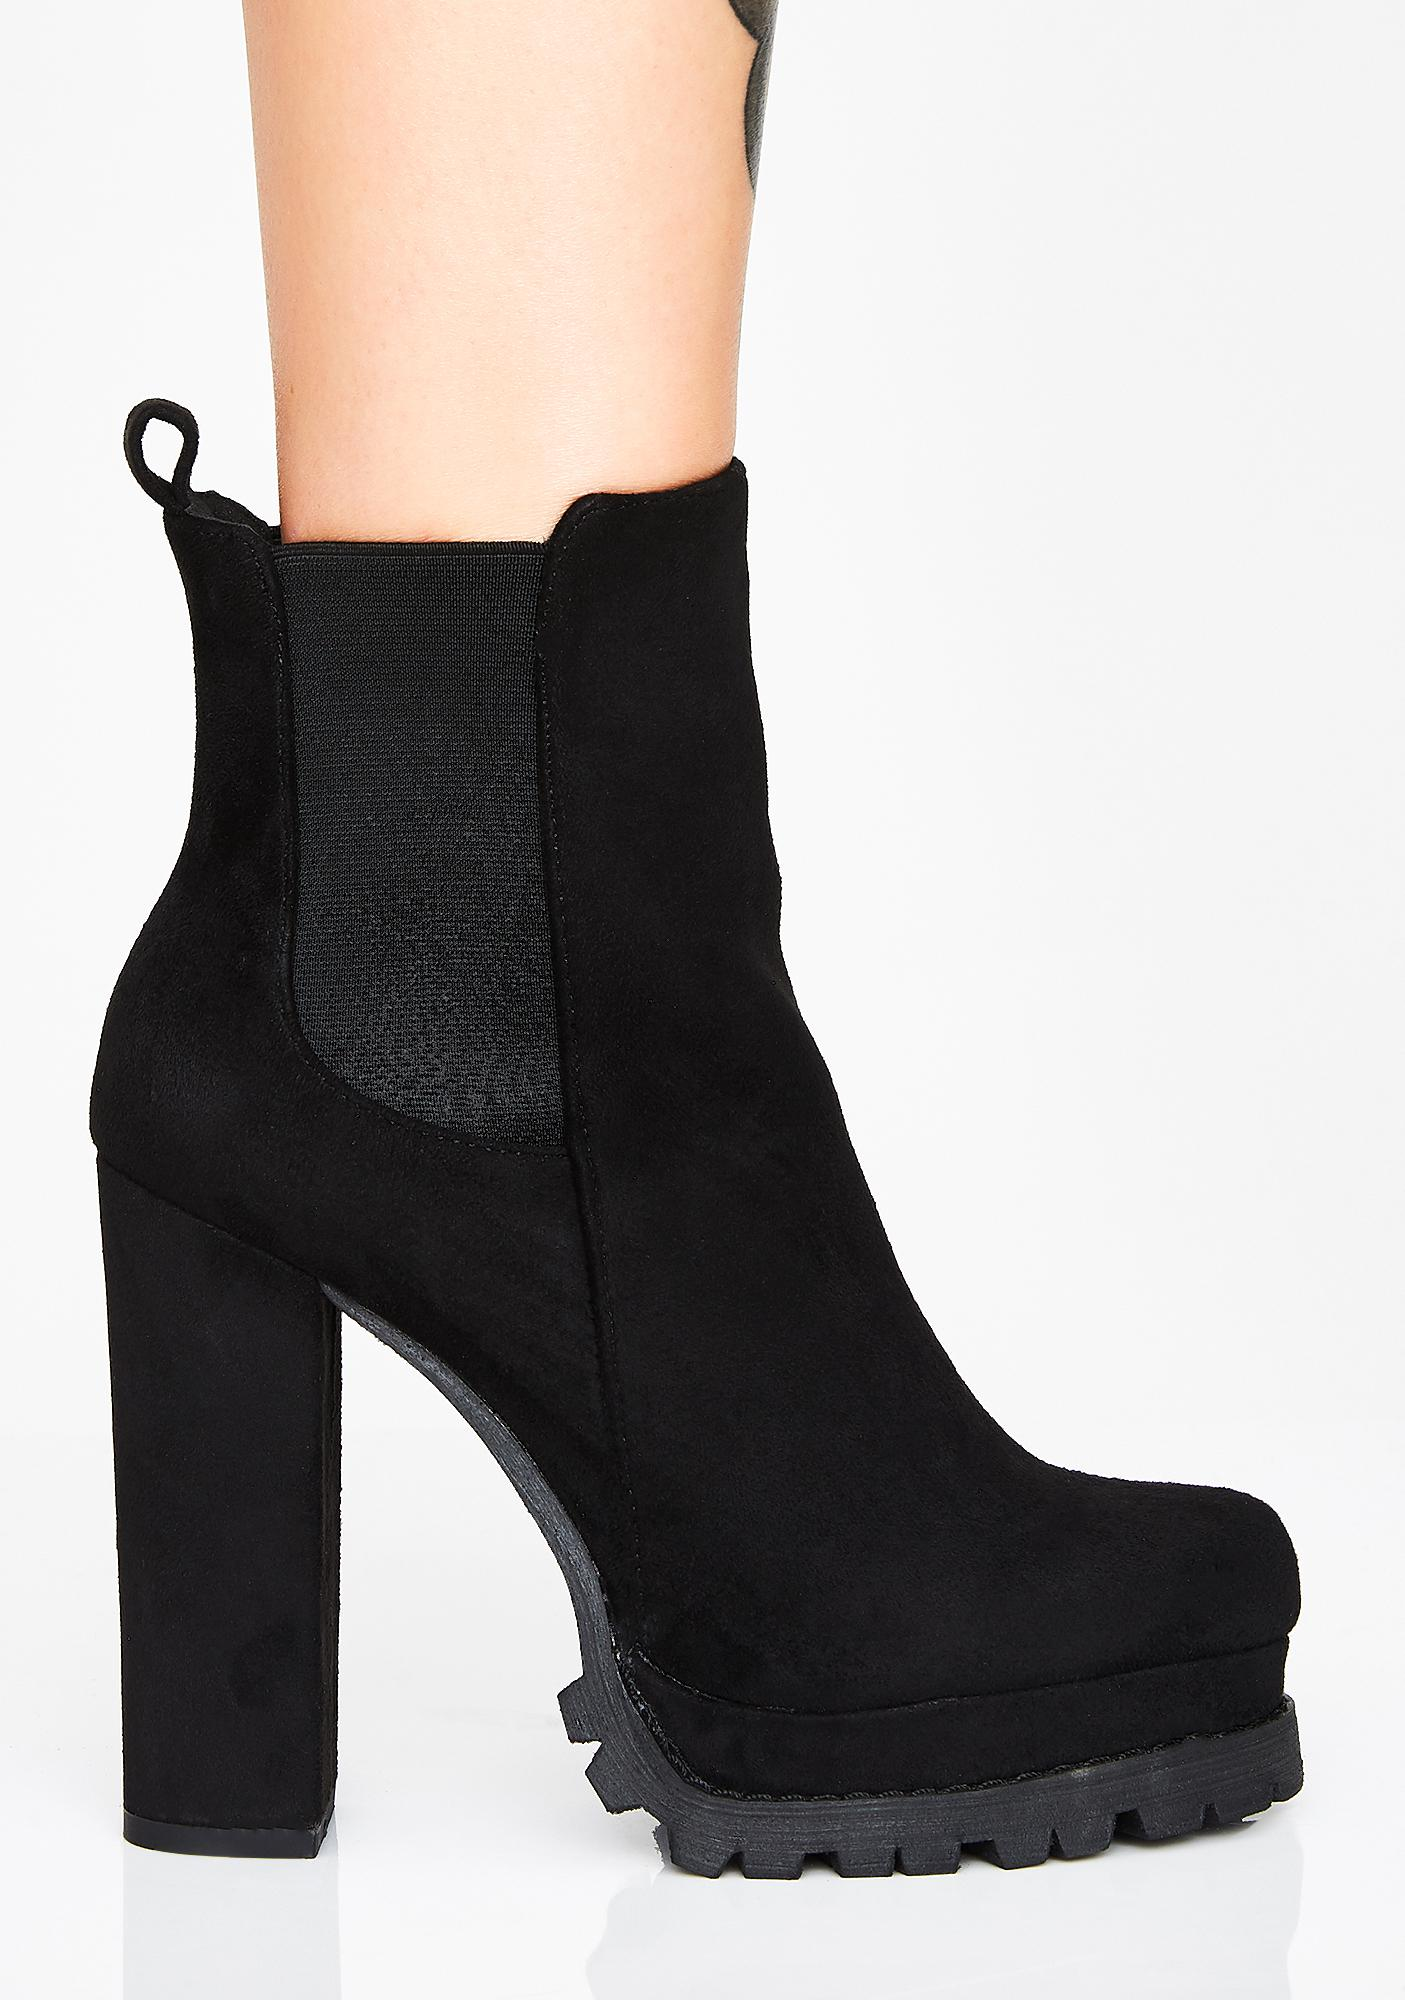 Monclair Movement Ankle Boots